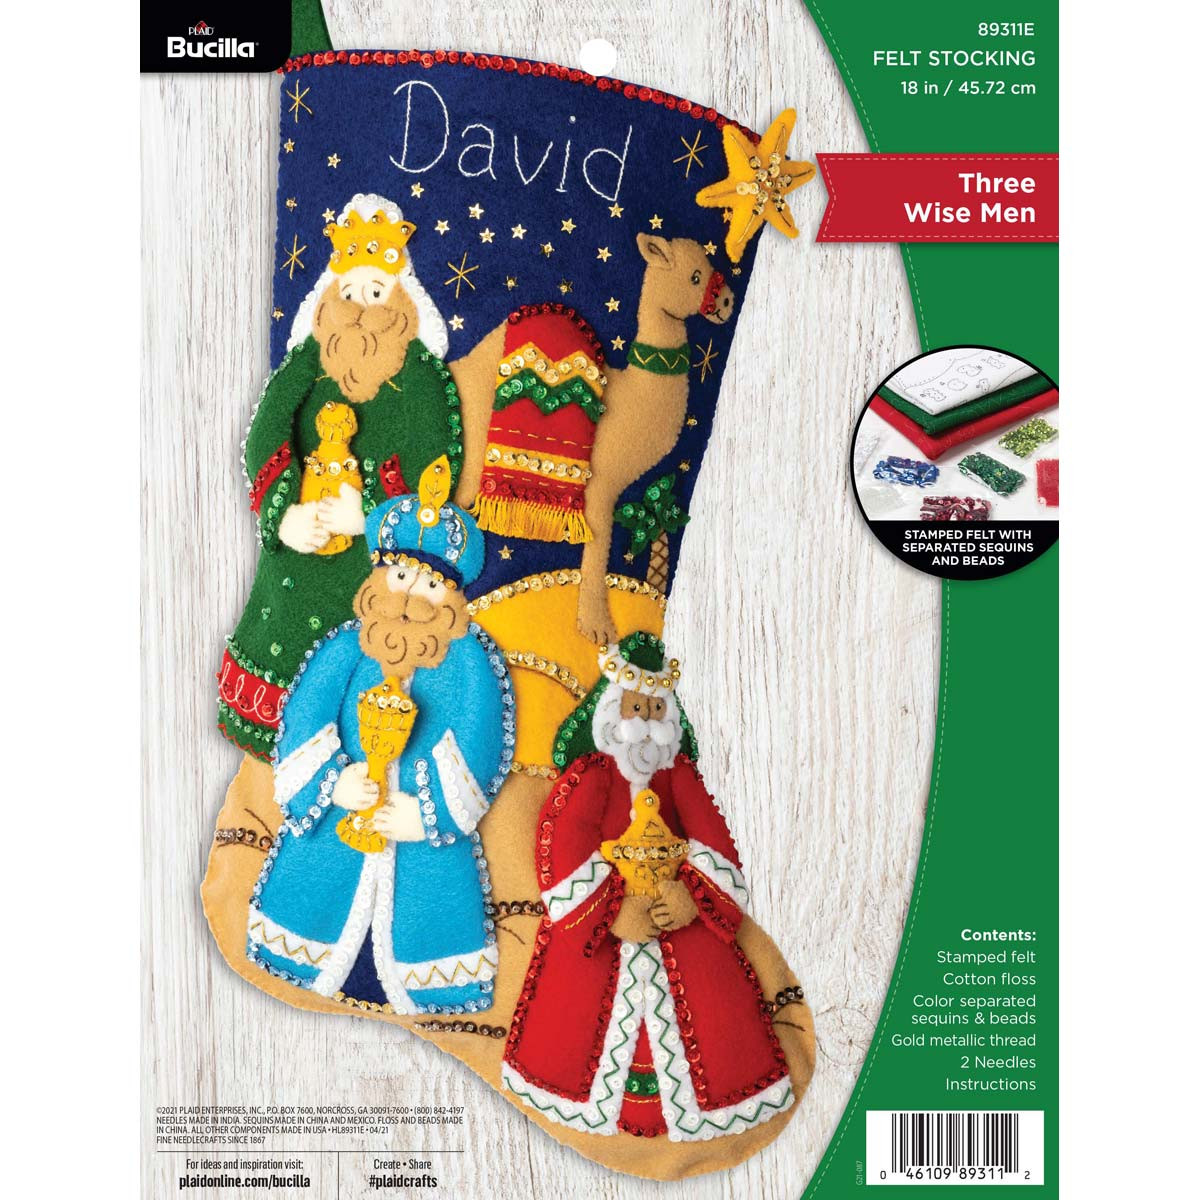 Bucilla ® Seasonal - Felt - Stocking Kits - Three Wisemen - 89311E